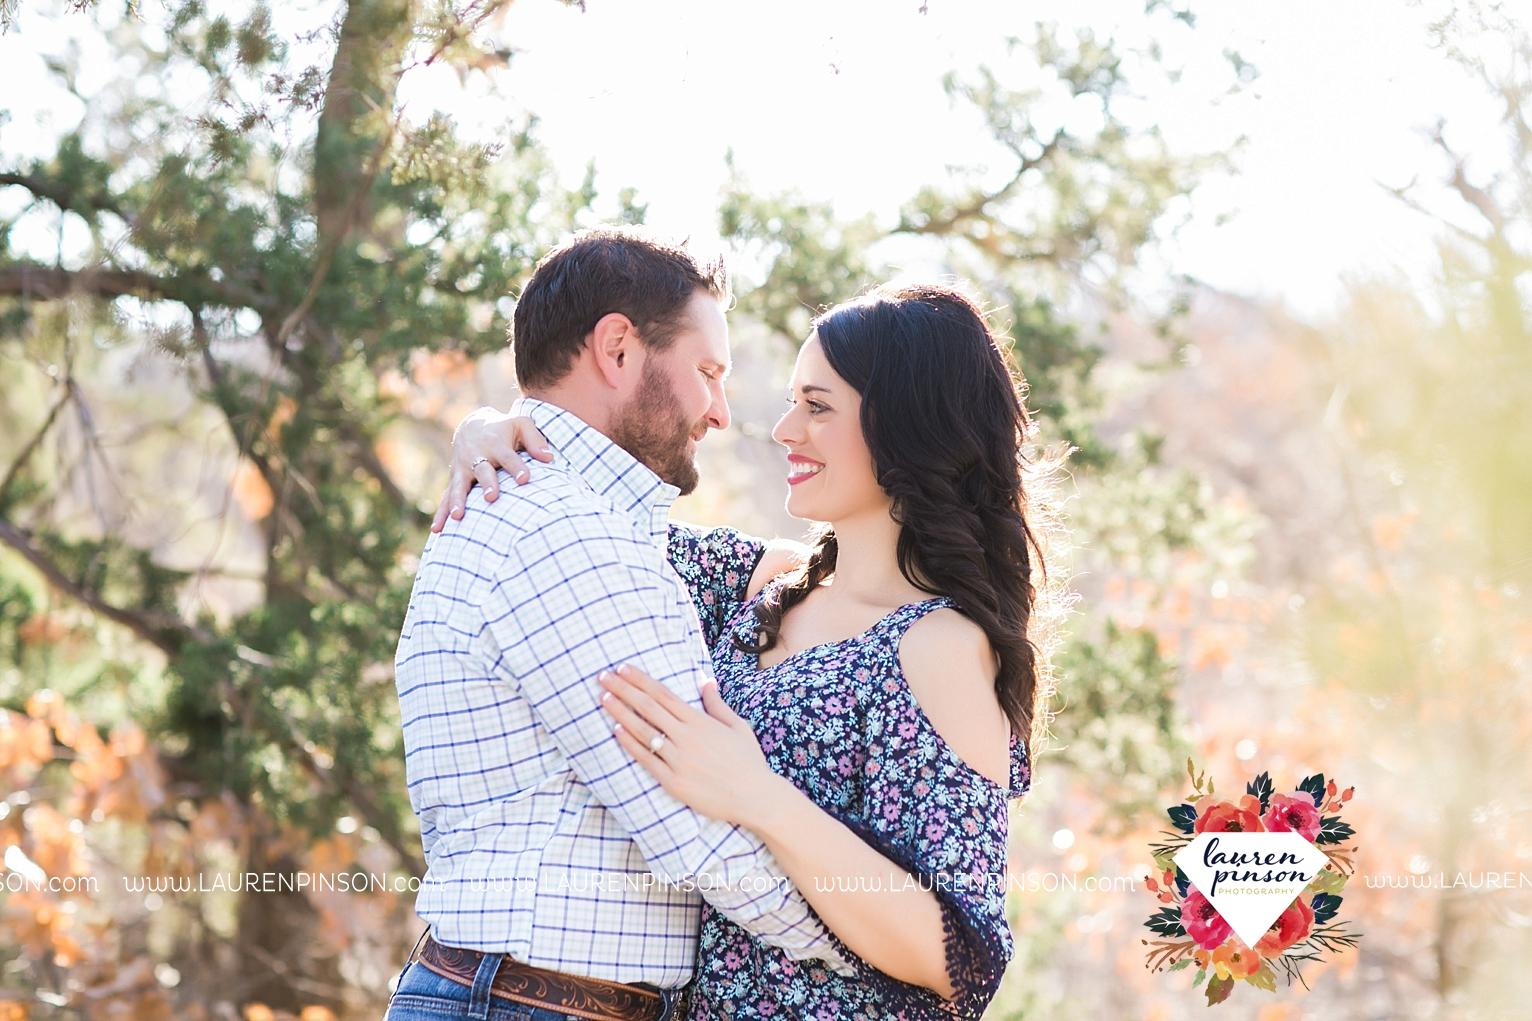 wichita-falls-texas-engagement-photographer-wedding-oklahoma-lawton-wichita-mountains-refuge-outdoors-mountains-engaged_2043.jpg